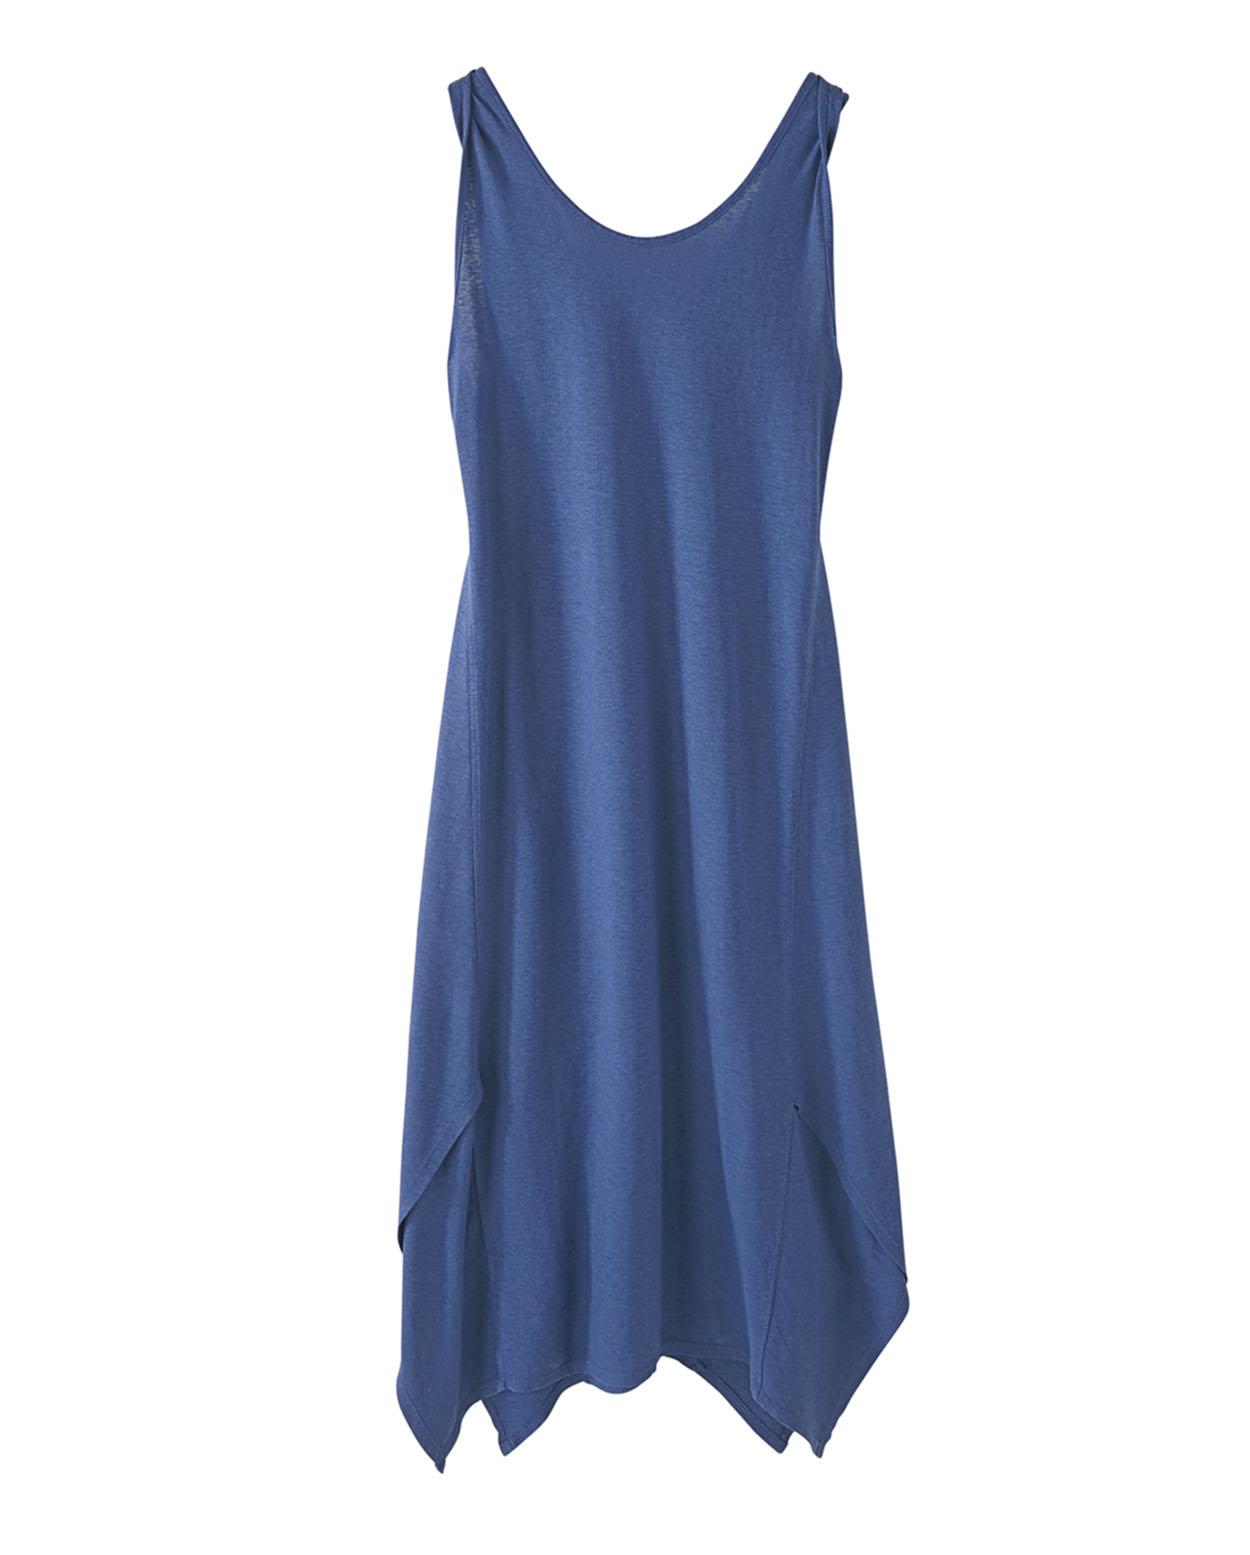 Kleid aus Hanf Baumwoll Jersey Wrap London